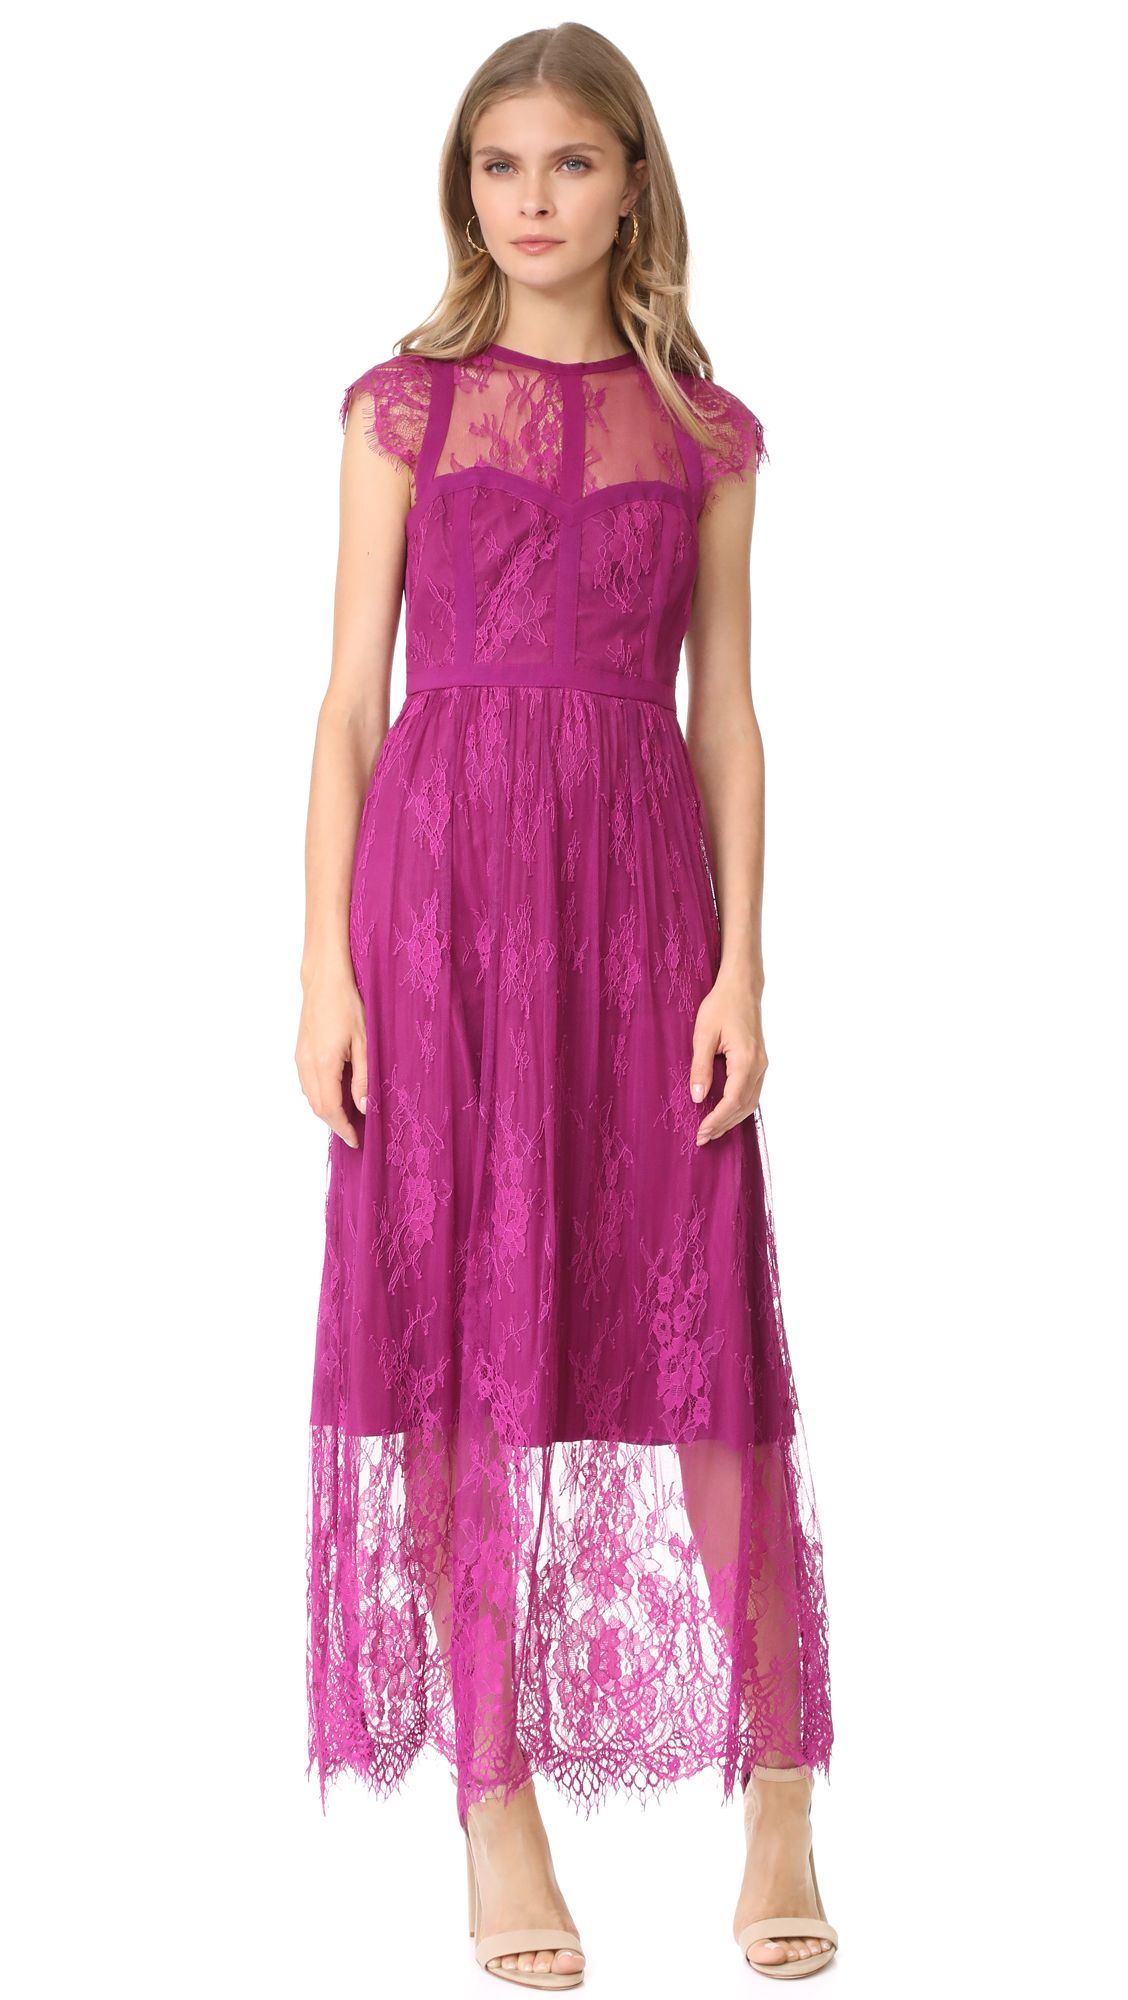 Raspberry lace dress   Parker Black Tesoro Dress #affiliate ...